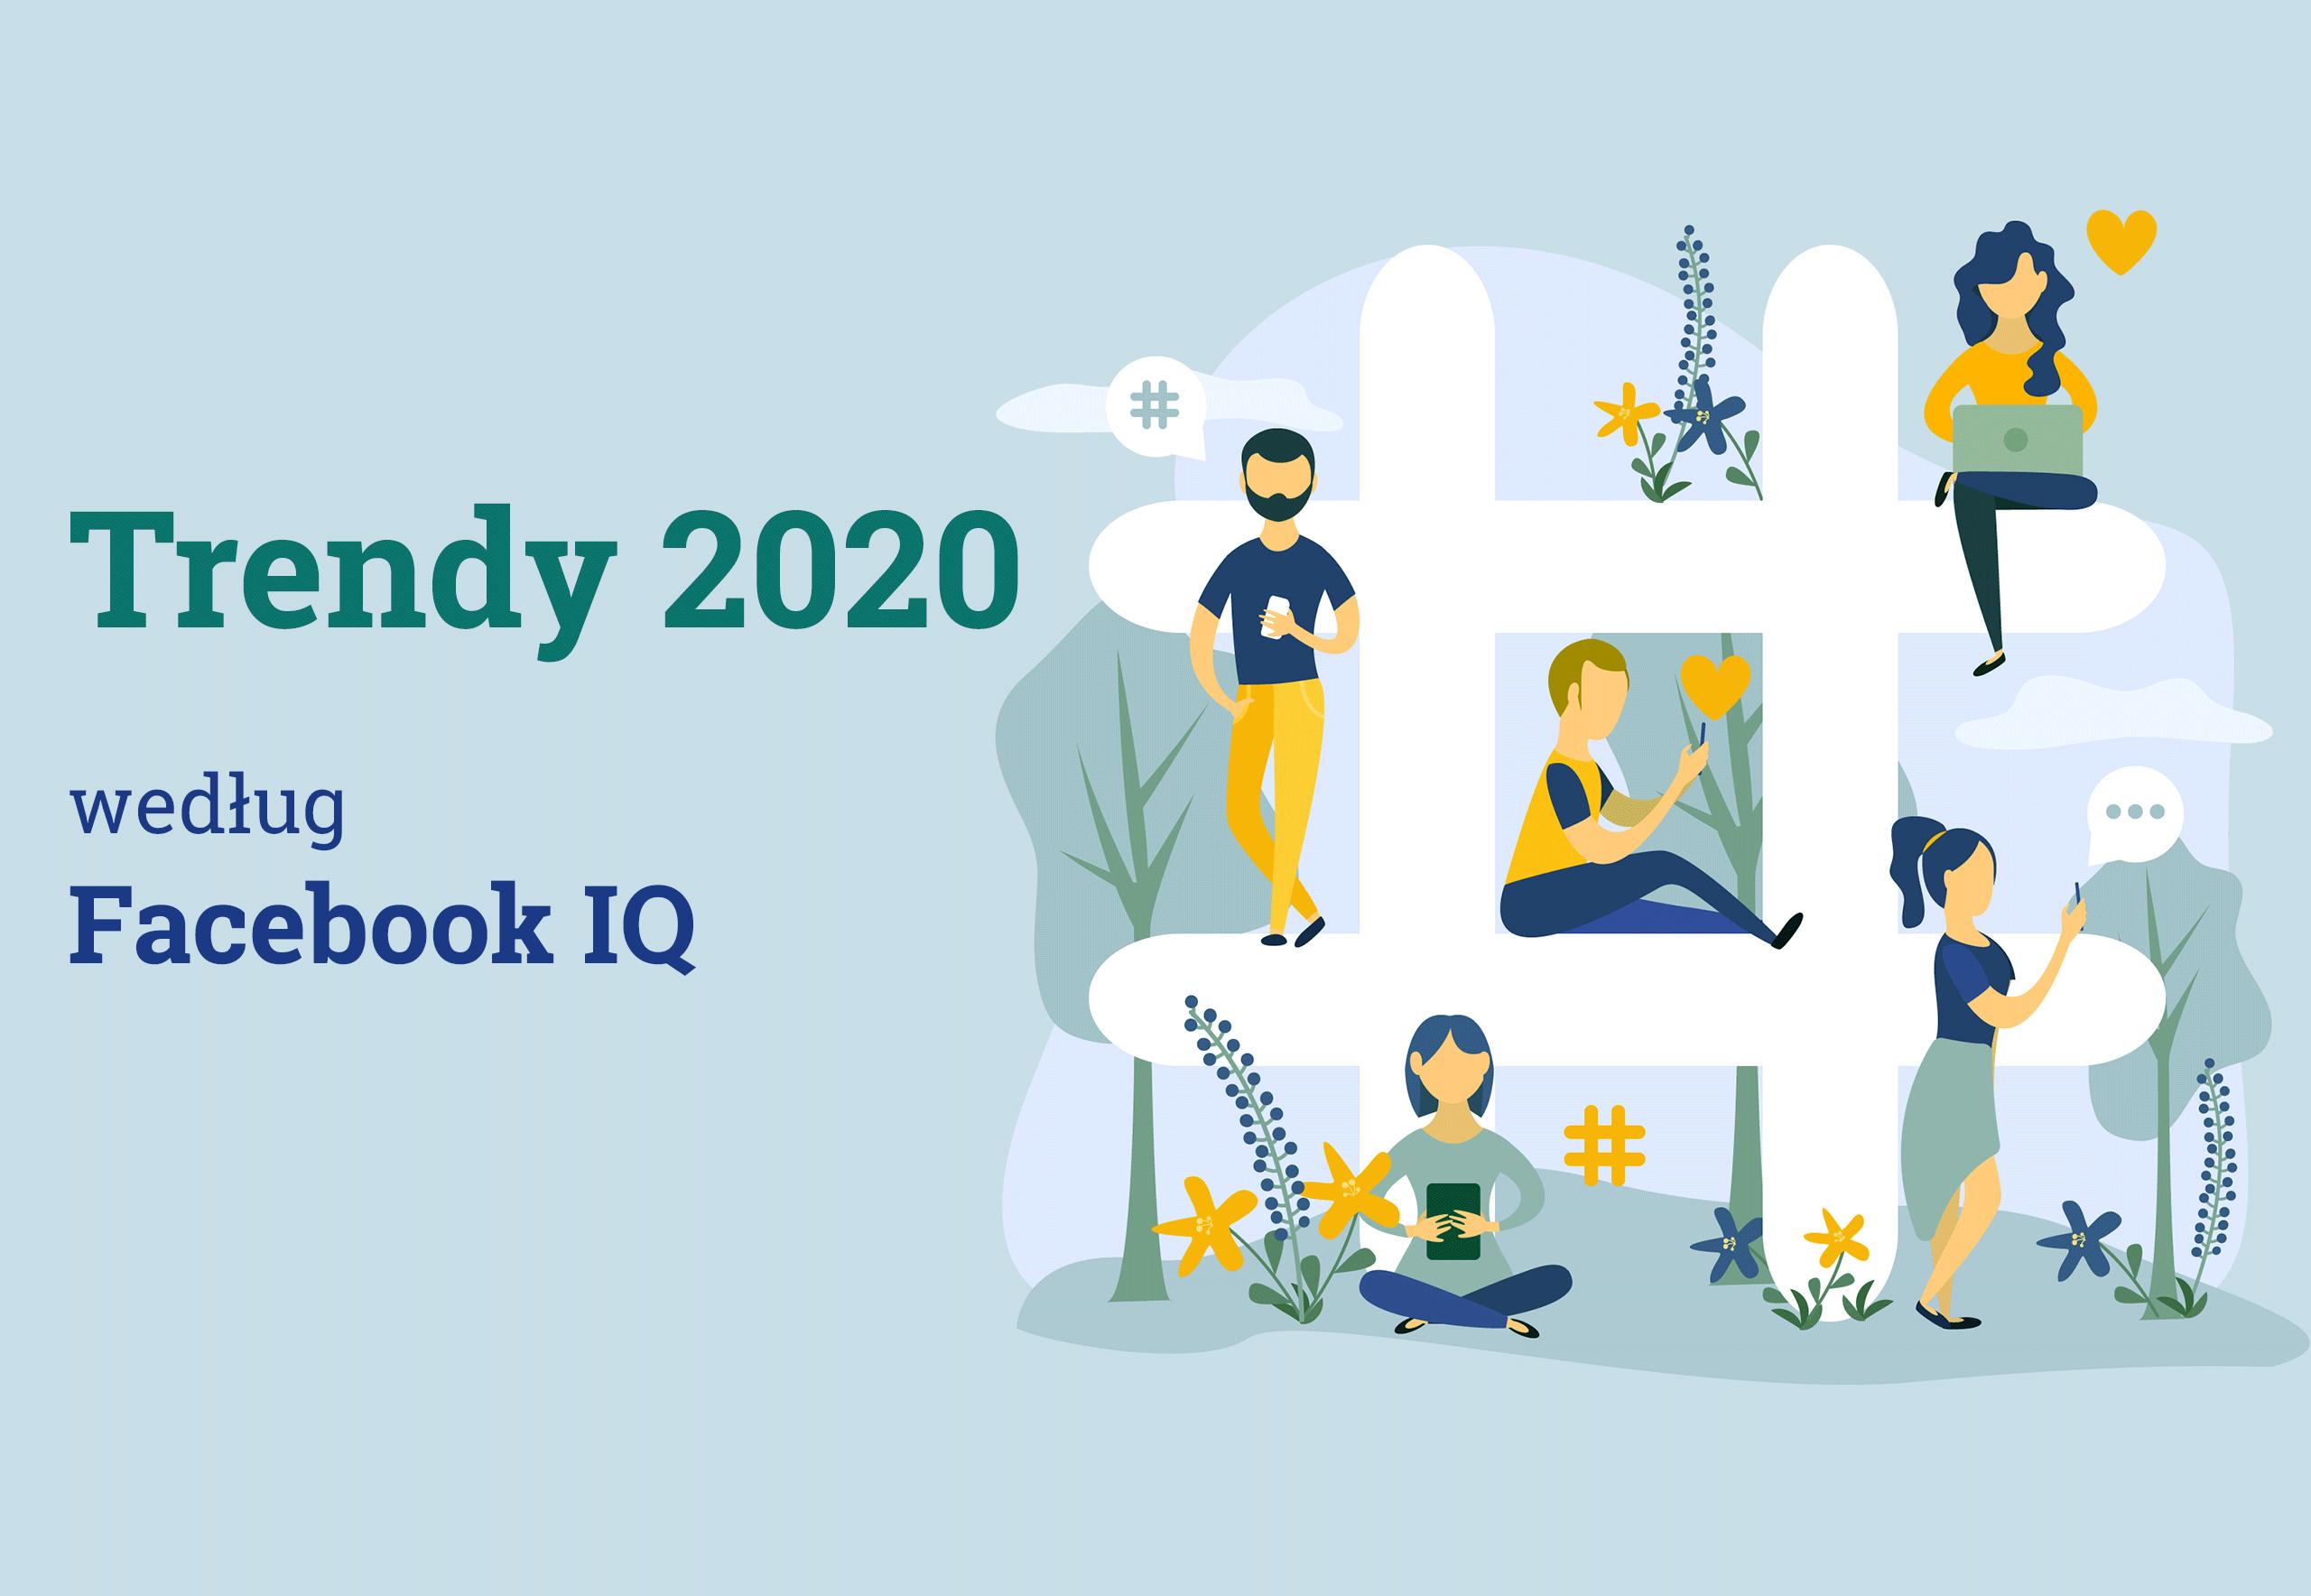 trendy 2020 facebook